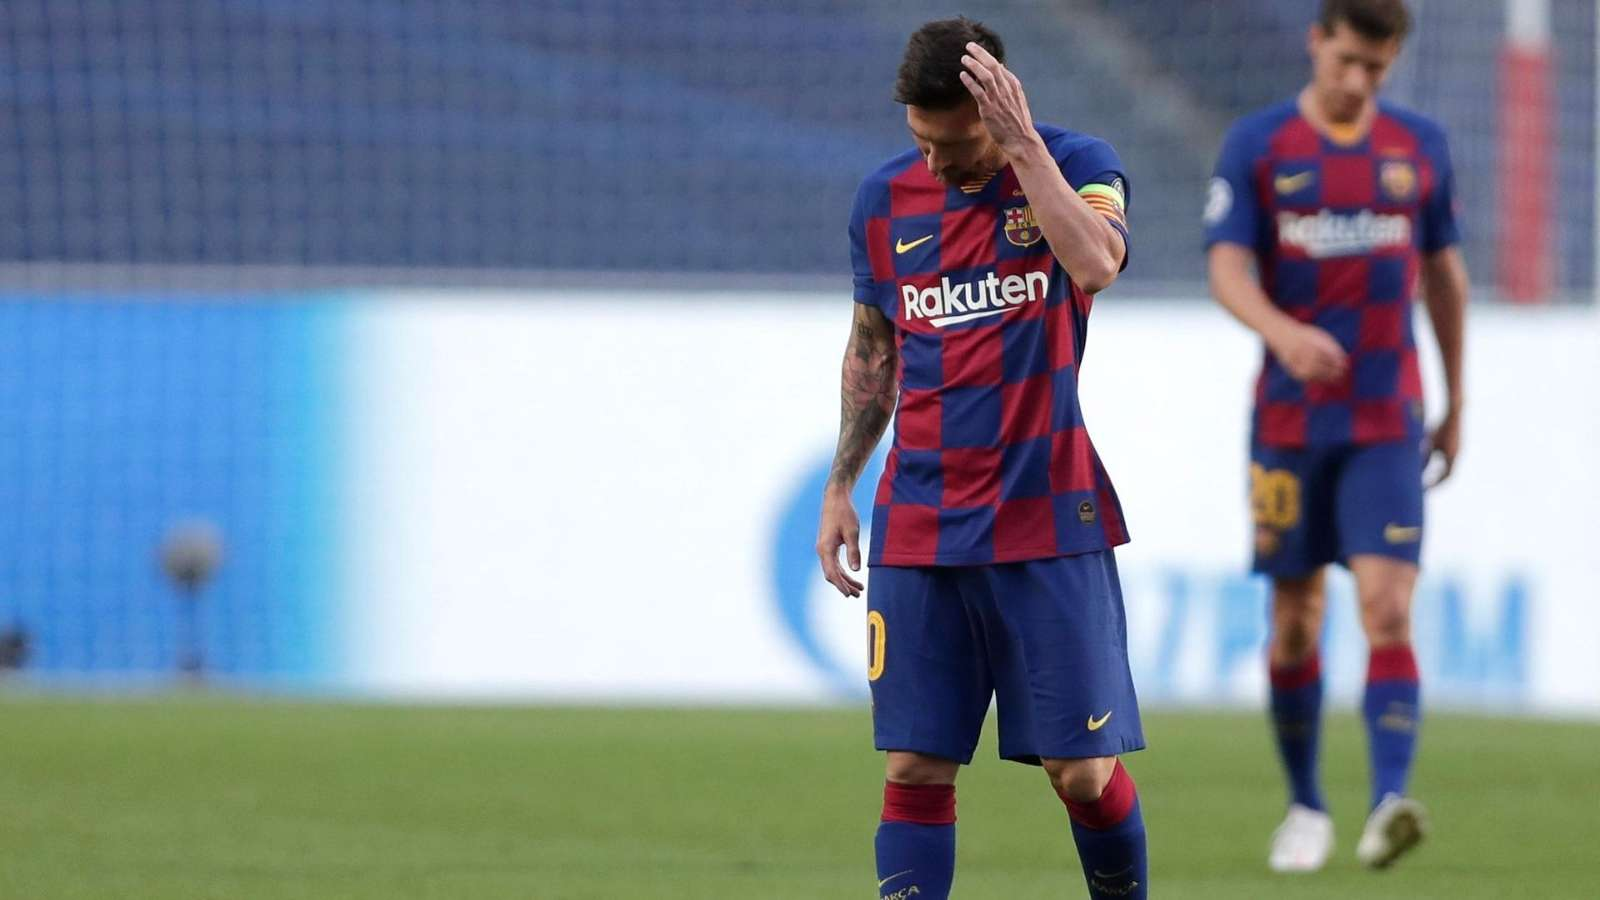 Photo of بعد فضيحة بايرن ميونخ .. ليفربول وميلان وأكبر خسائر برشلونة في دوري أبطال أوروبا